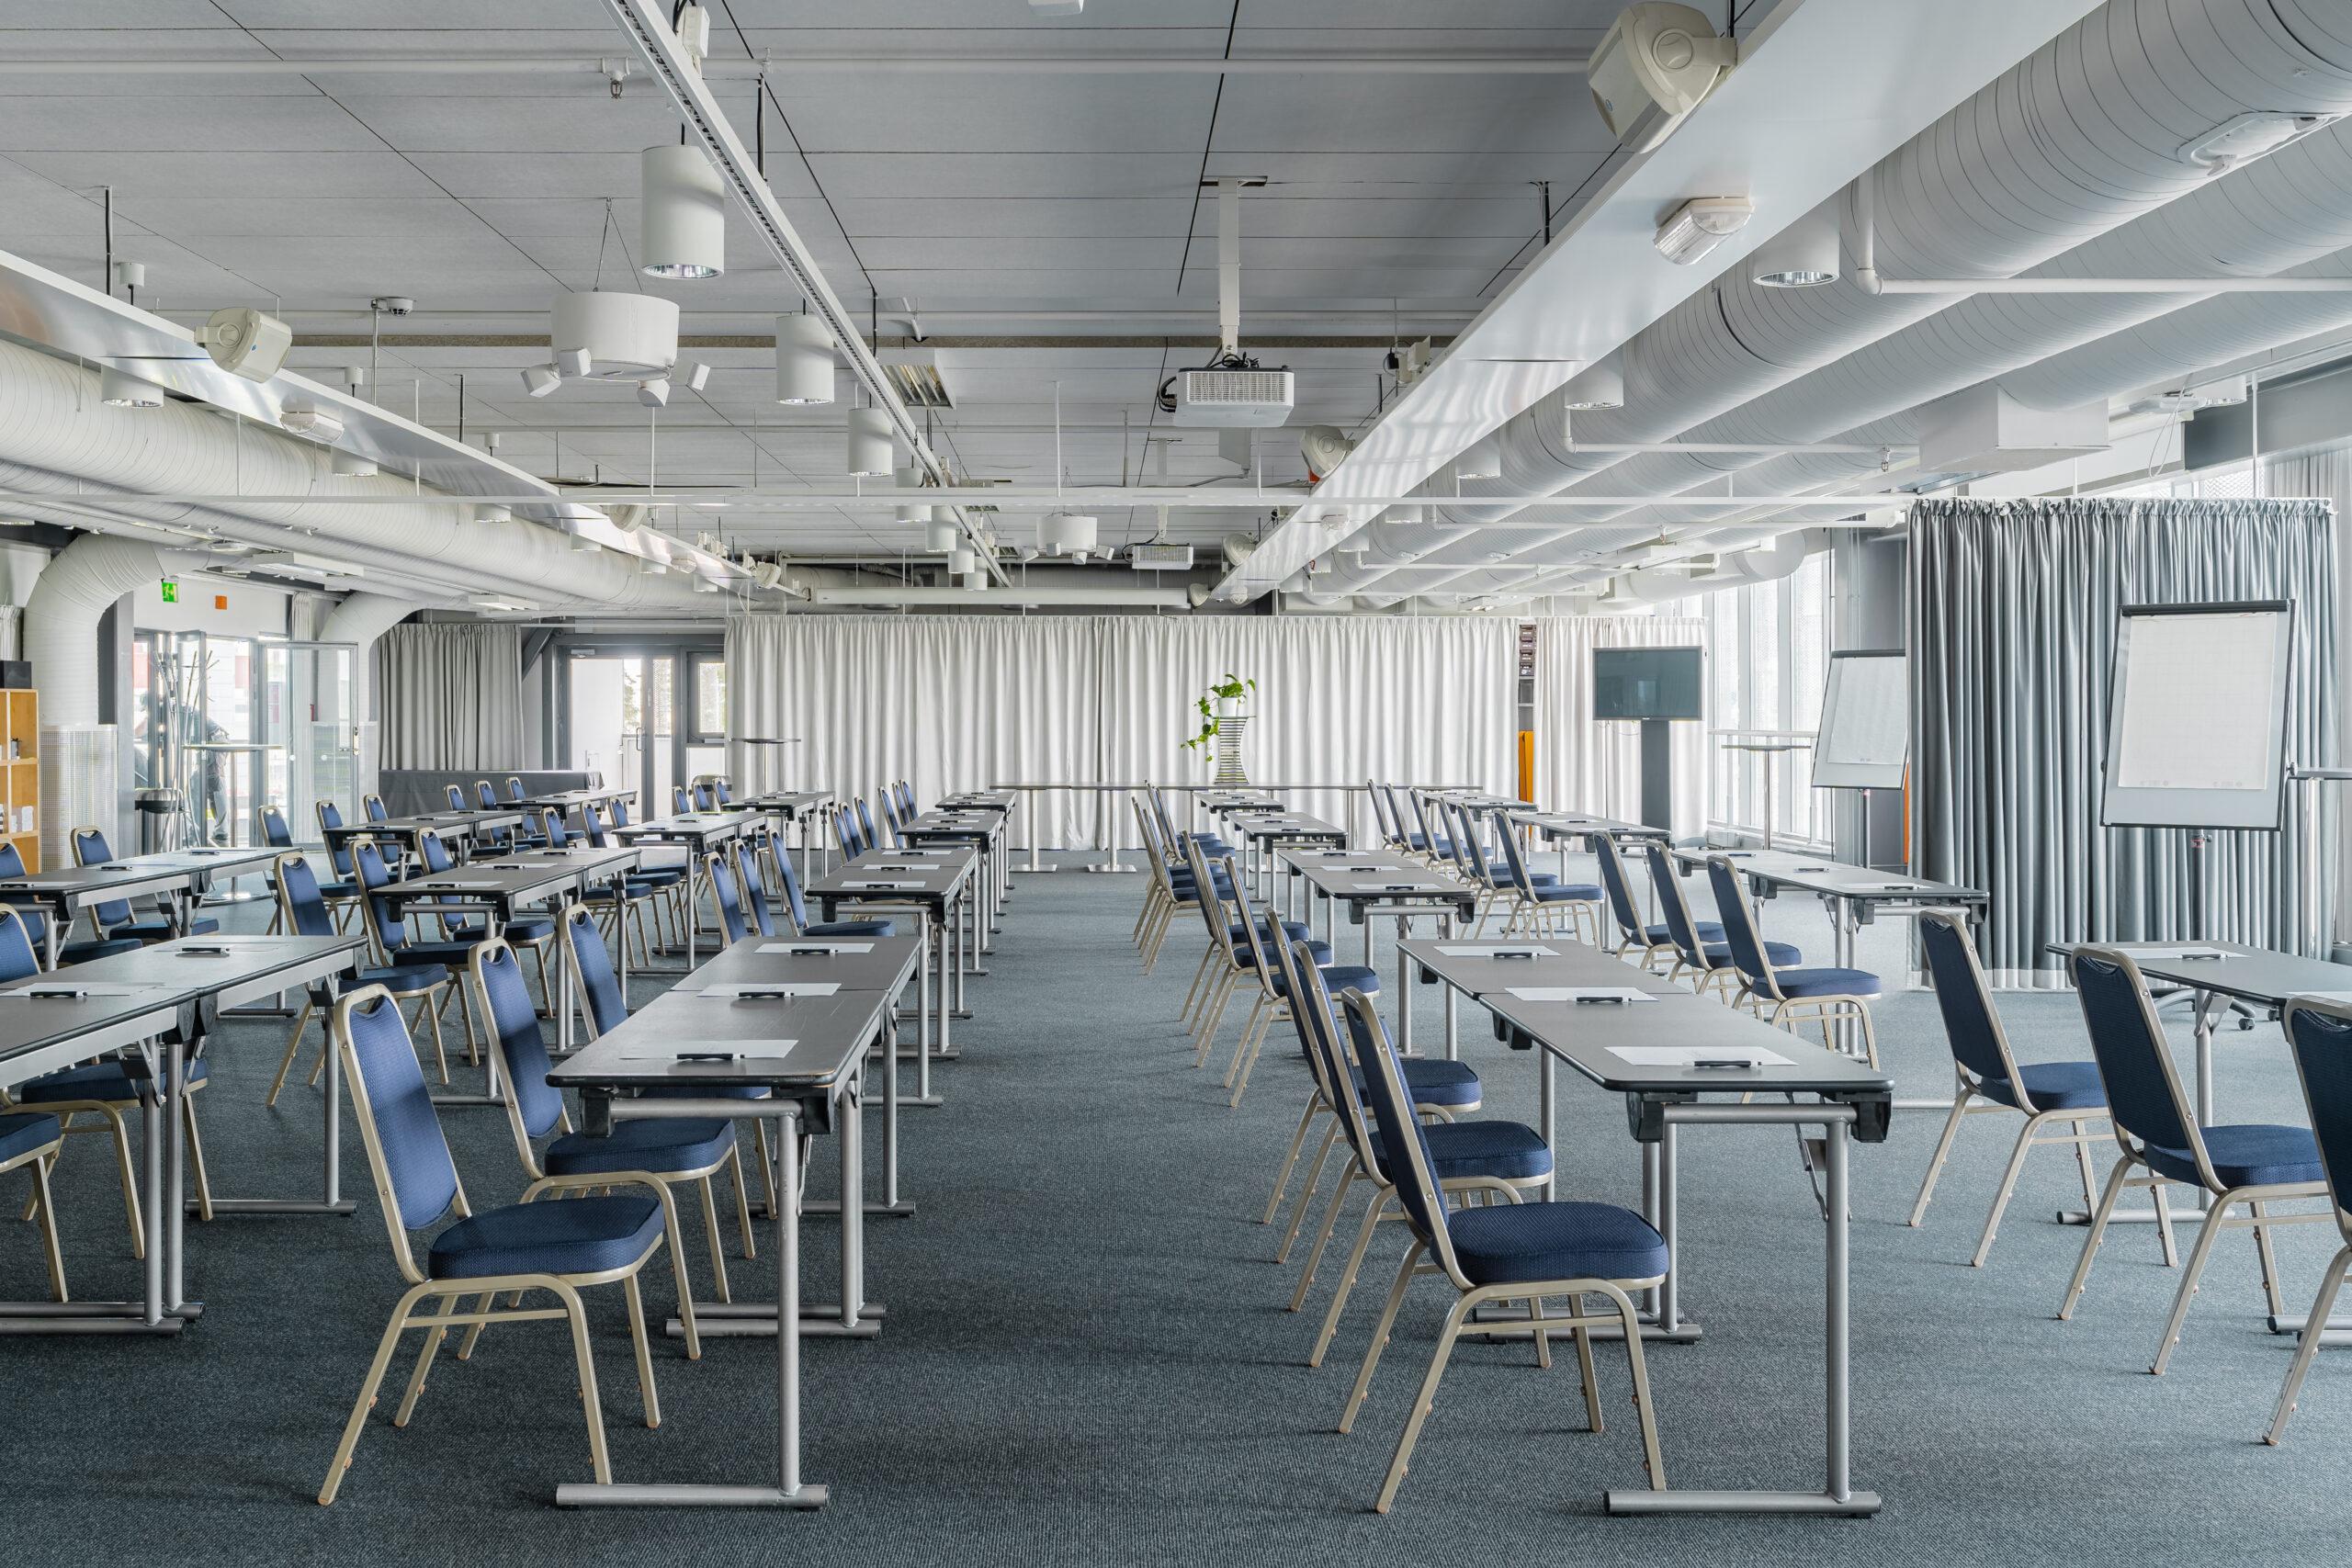 210909-Restel-Hartwall-Areena-Meeting-Center-K2-HI-RES-1